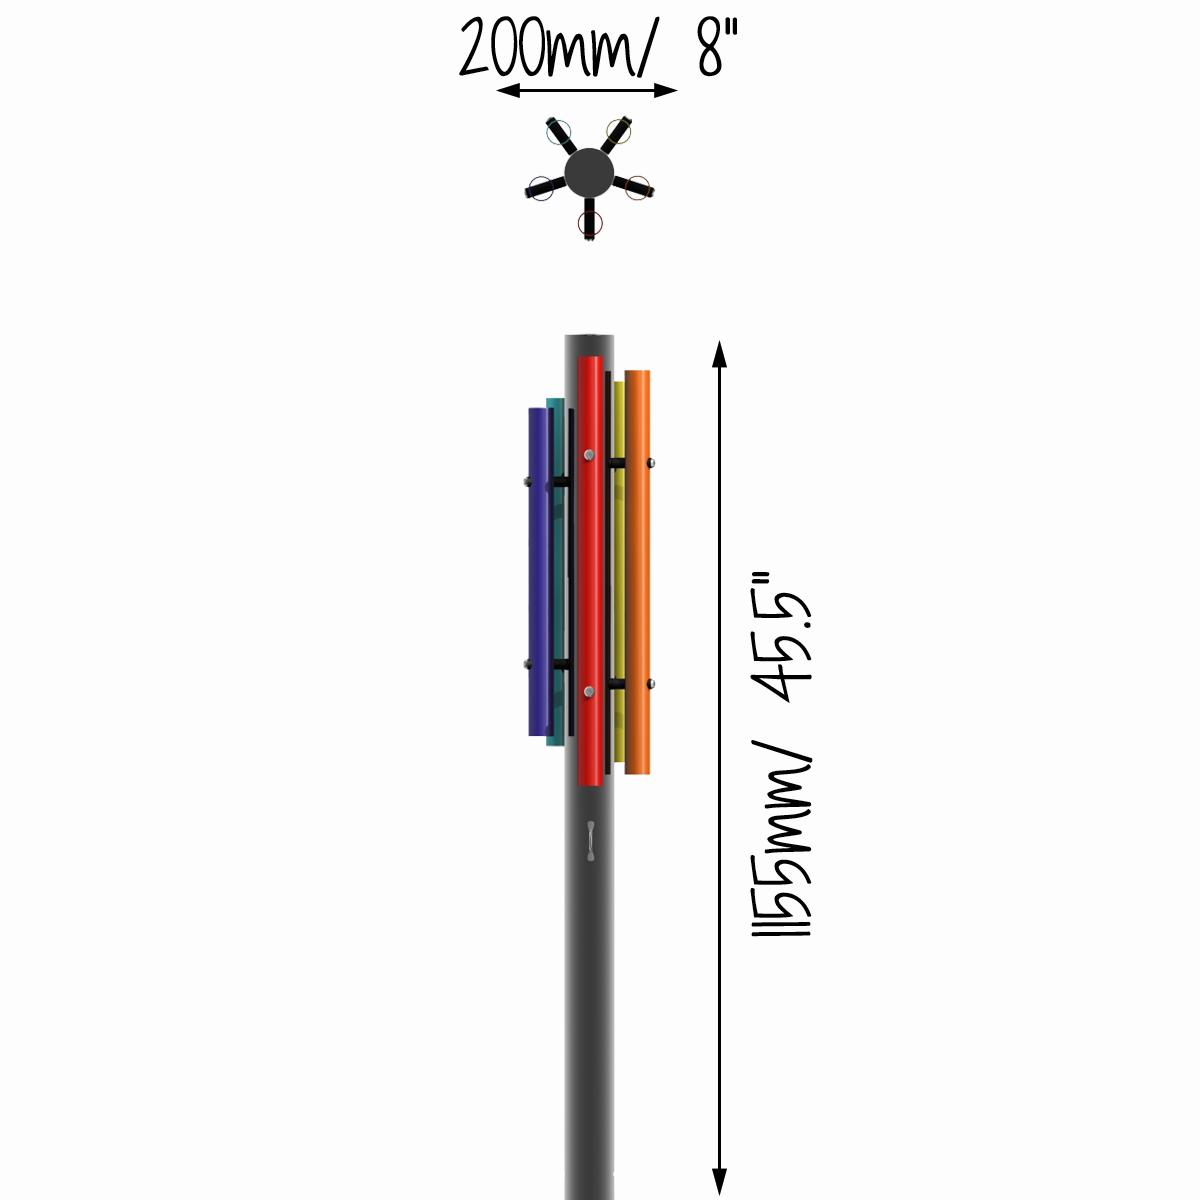 rainbow-chime-post-elevations-new-brochu